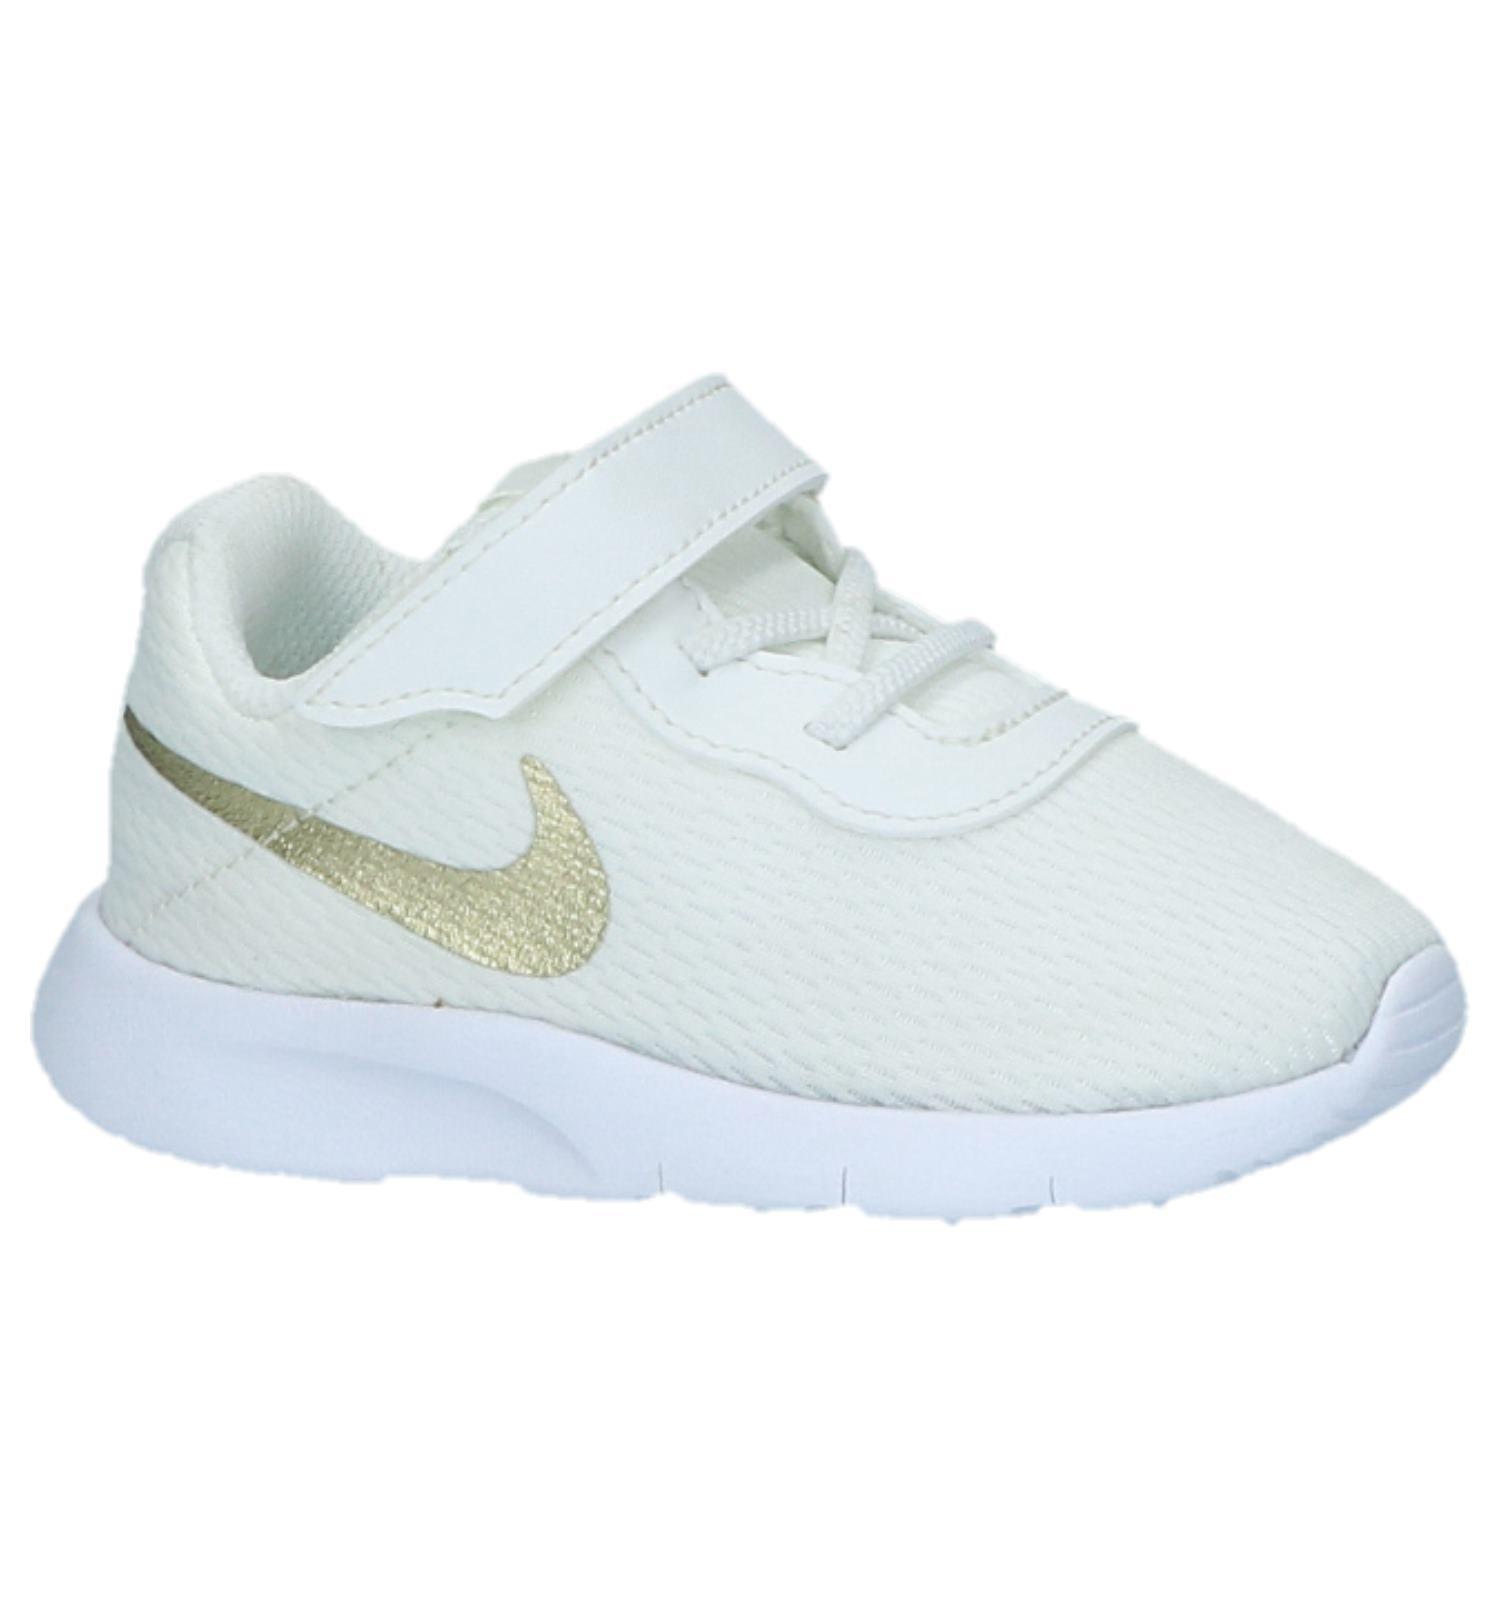 01c68bbbfb4 Nike Tanjun TDV Witte Sneakertjes | TORFS.BE | Gratis verzend en retour